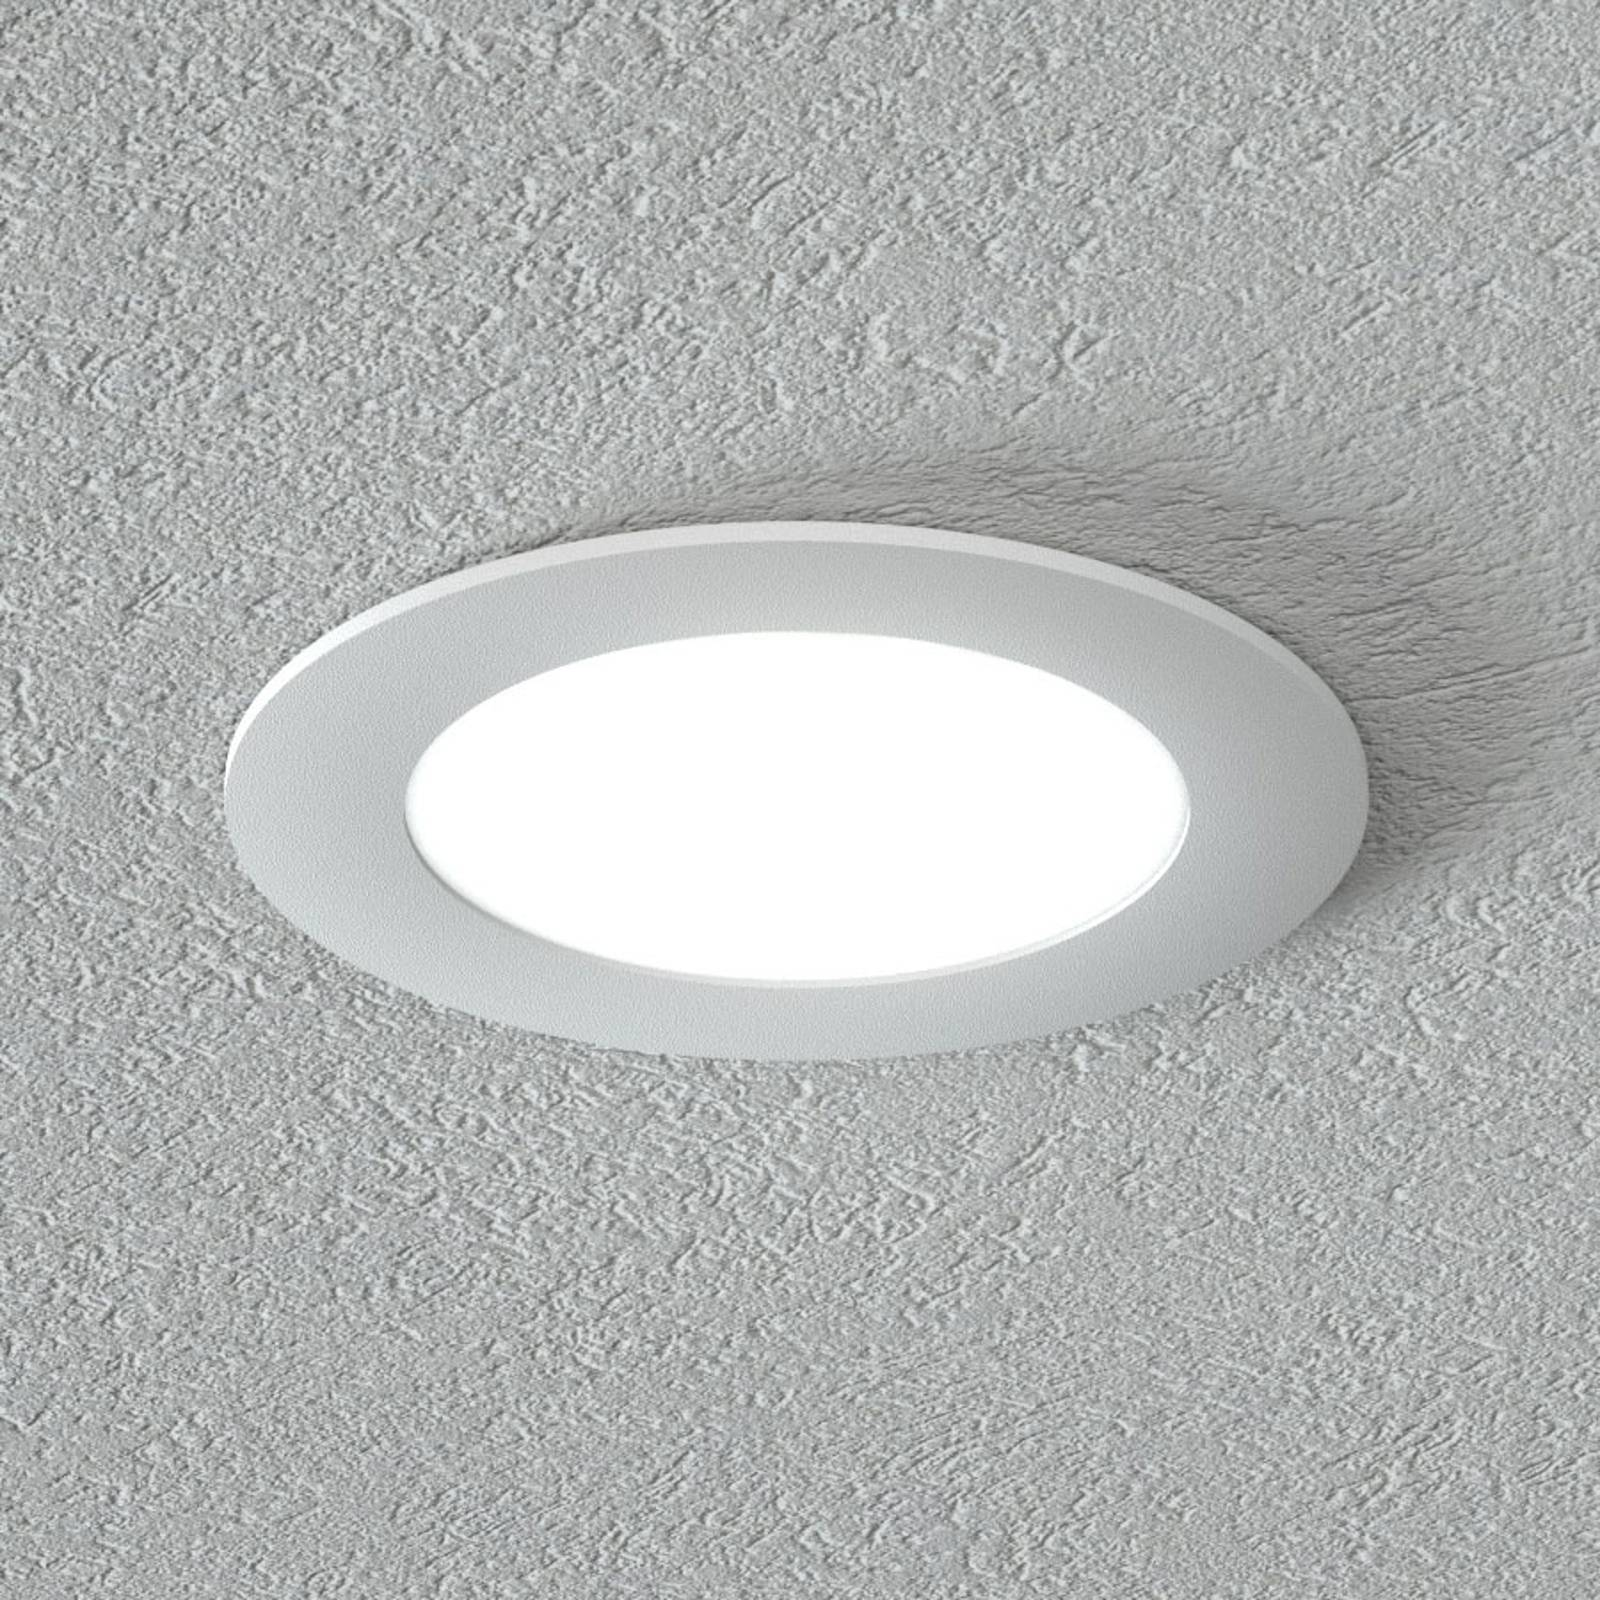 Arcchio Xavian -LED-uppovalo 3 000 K 9,8 cm